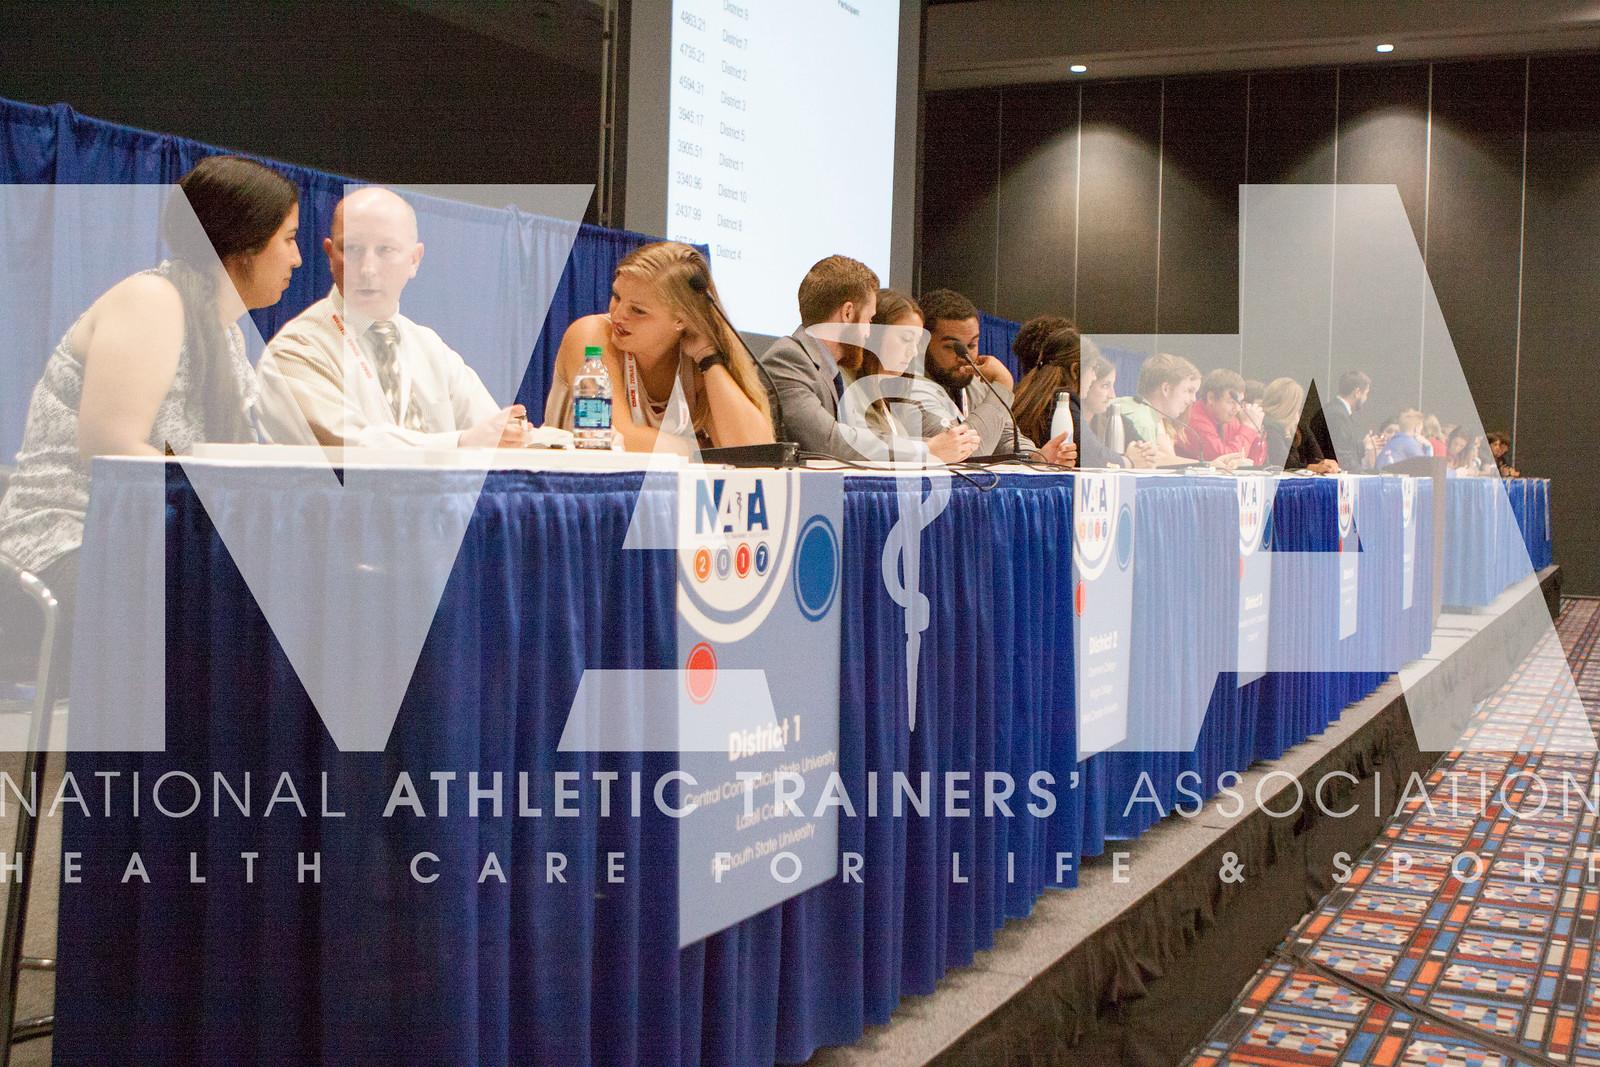 J. Kat Woronowicz photos/Quiz Bowl at the NATA Wednesday, June 28th, 2017.